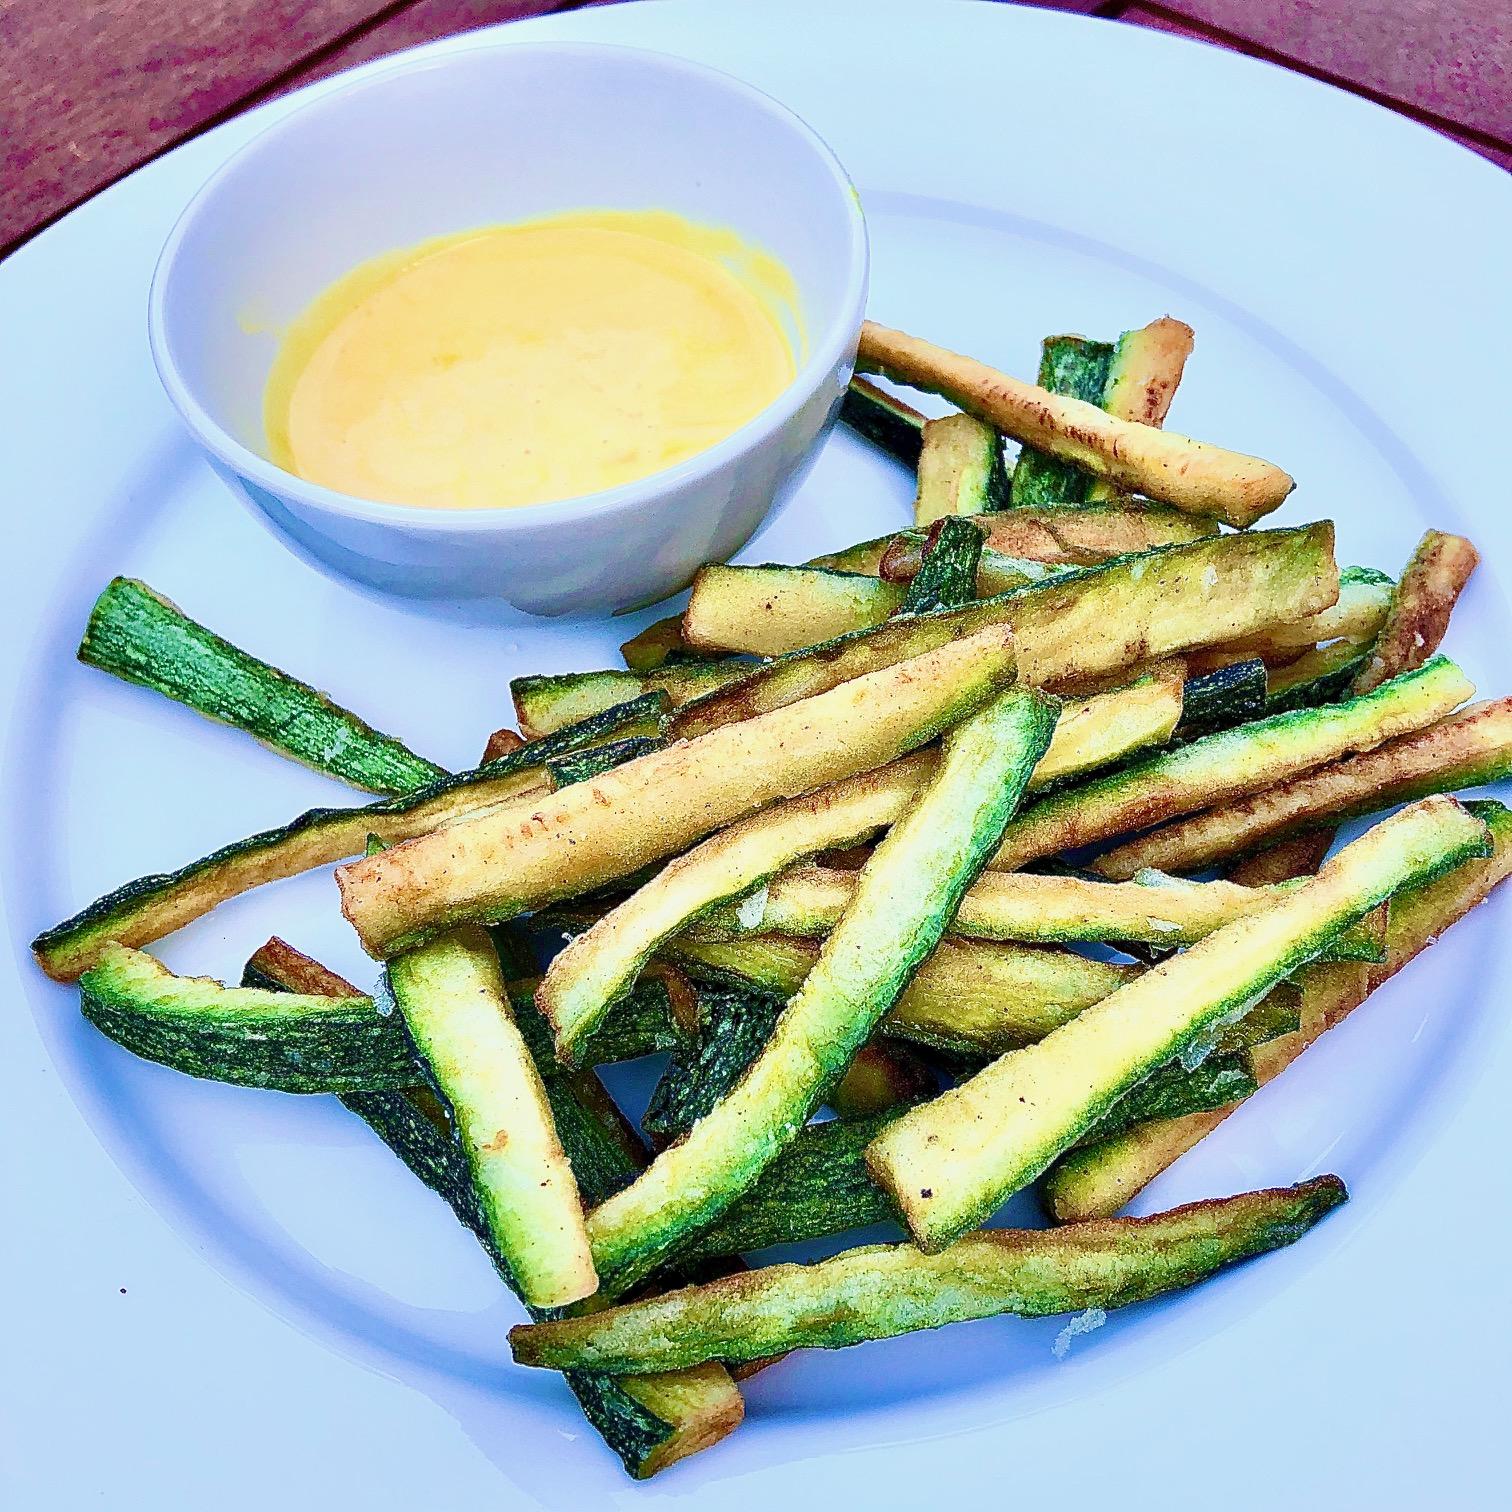 Day 68: Zucchine Fritti